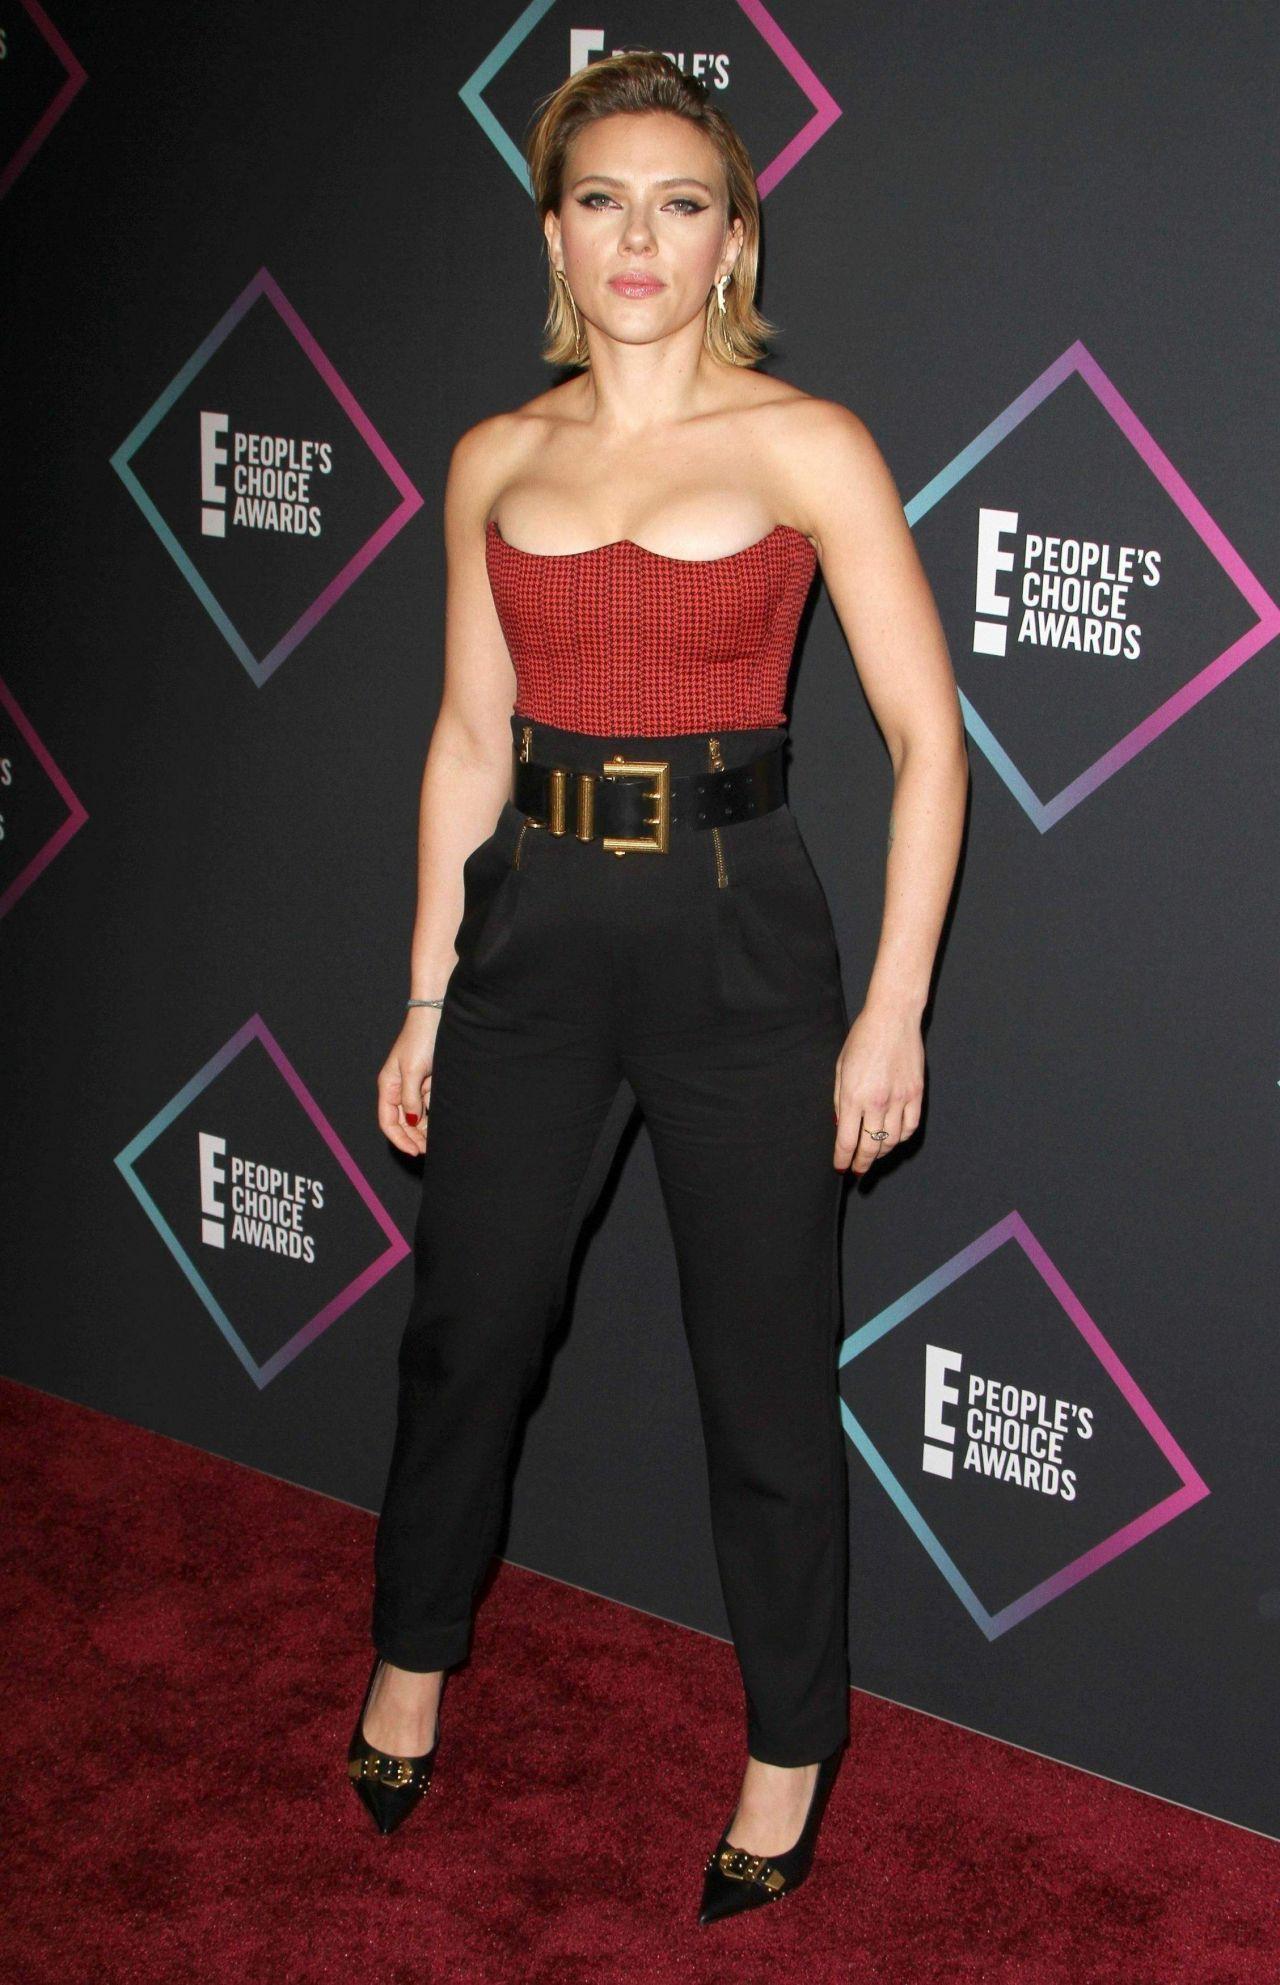 Scarlett Johansson Scarlett Johansson Bikini Scarlett Johanson Black Widow Scarlett